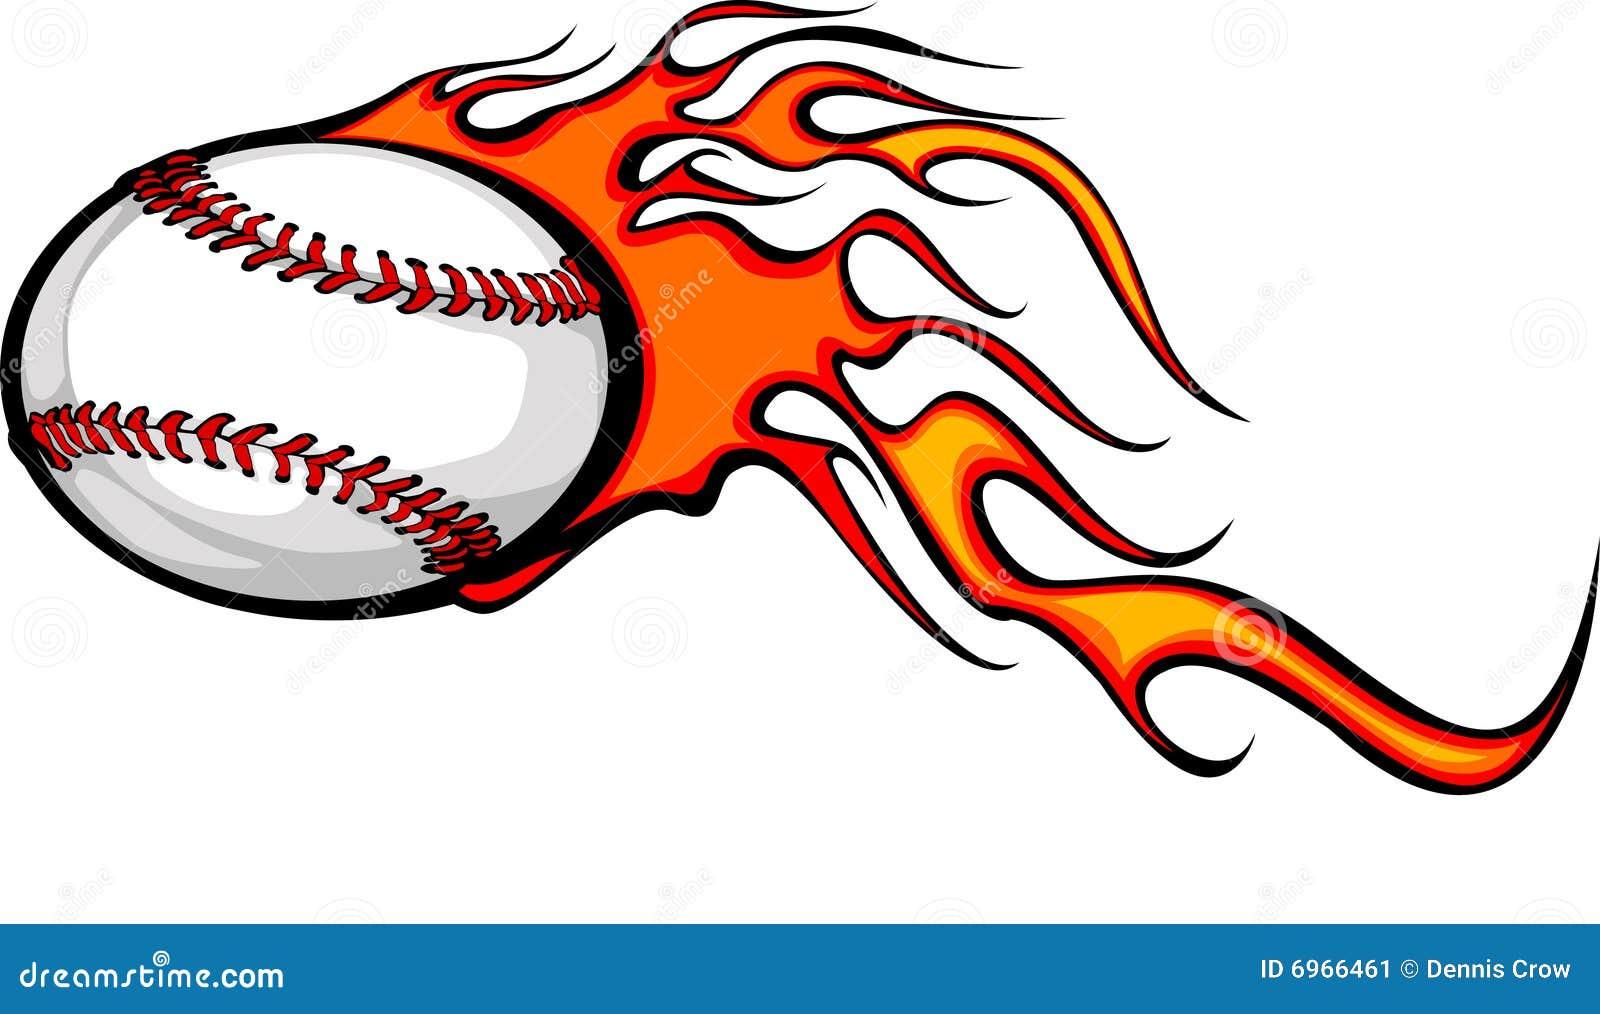 flaming baseball ball stock vector illustration of futbol 6966461 rh dreamstime com Flaming Baseball Clip Art flaming baseball logo quiz